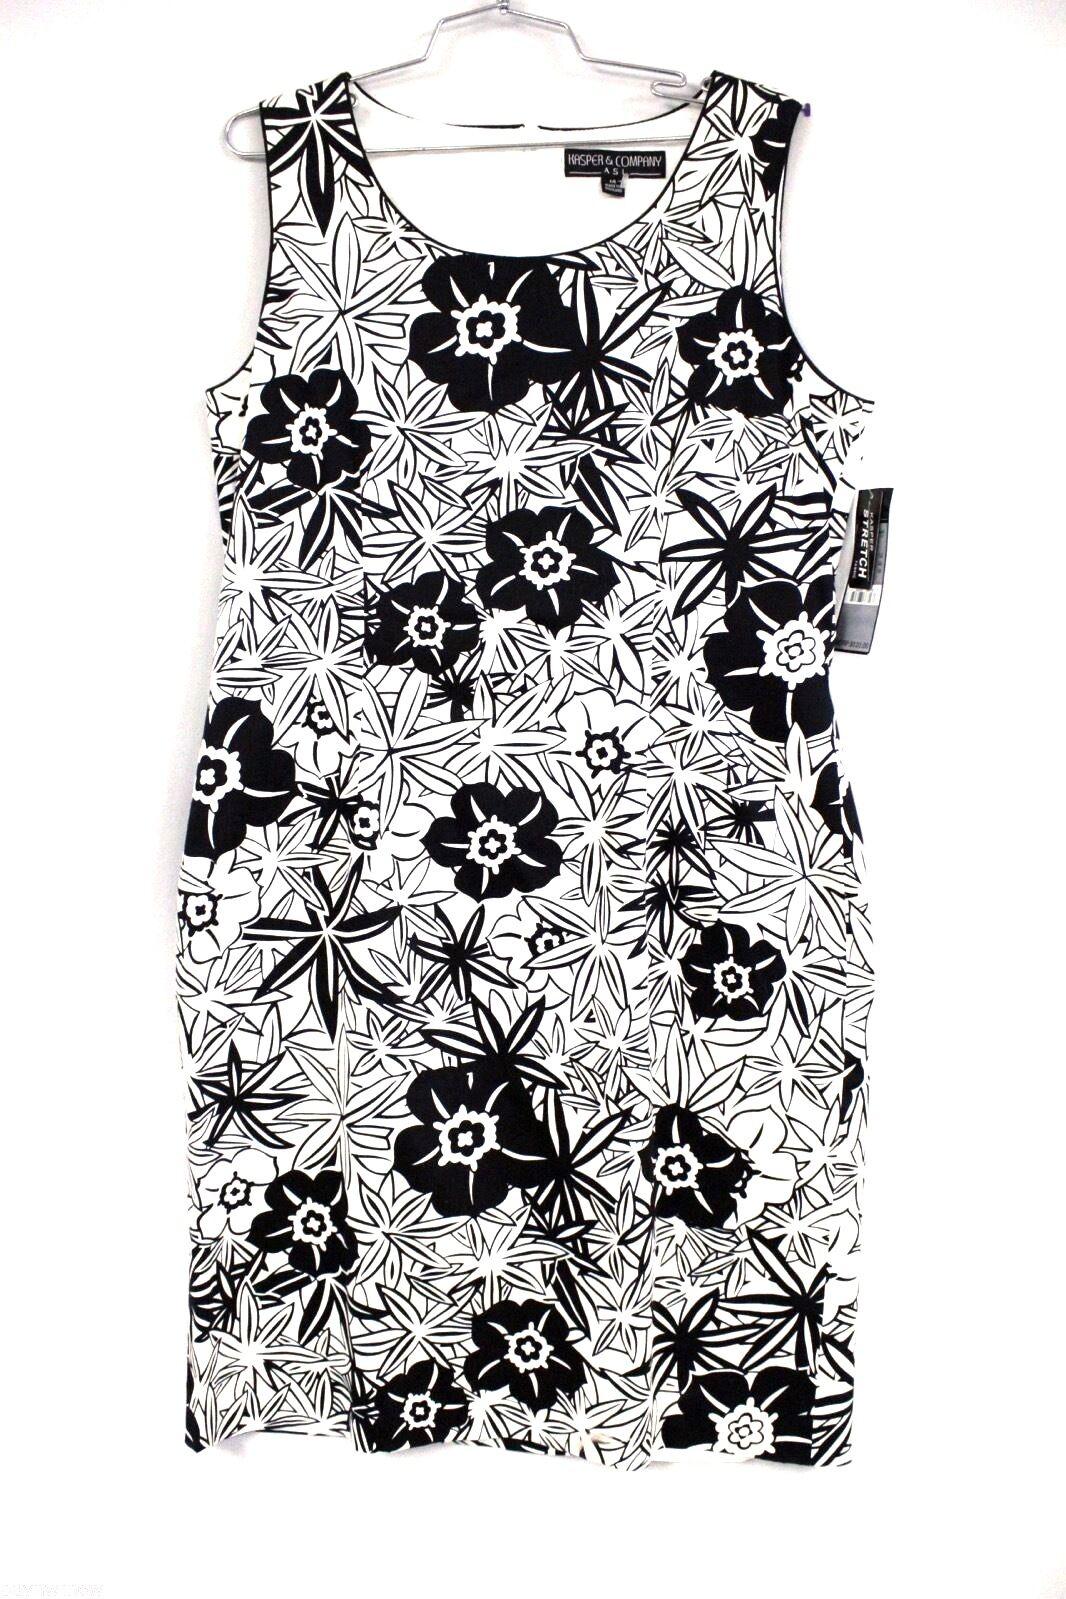 Kasper & Co schwarz Weiß Floral Stretch Cotton Sleeveless SheathDress 14 NWT